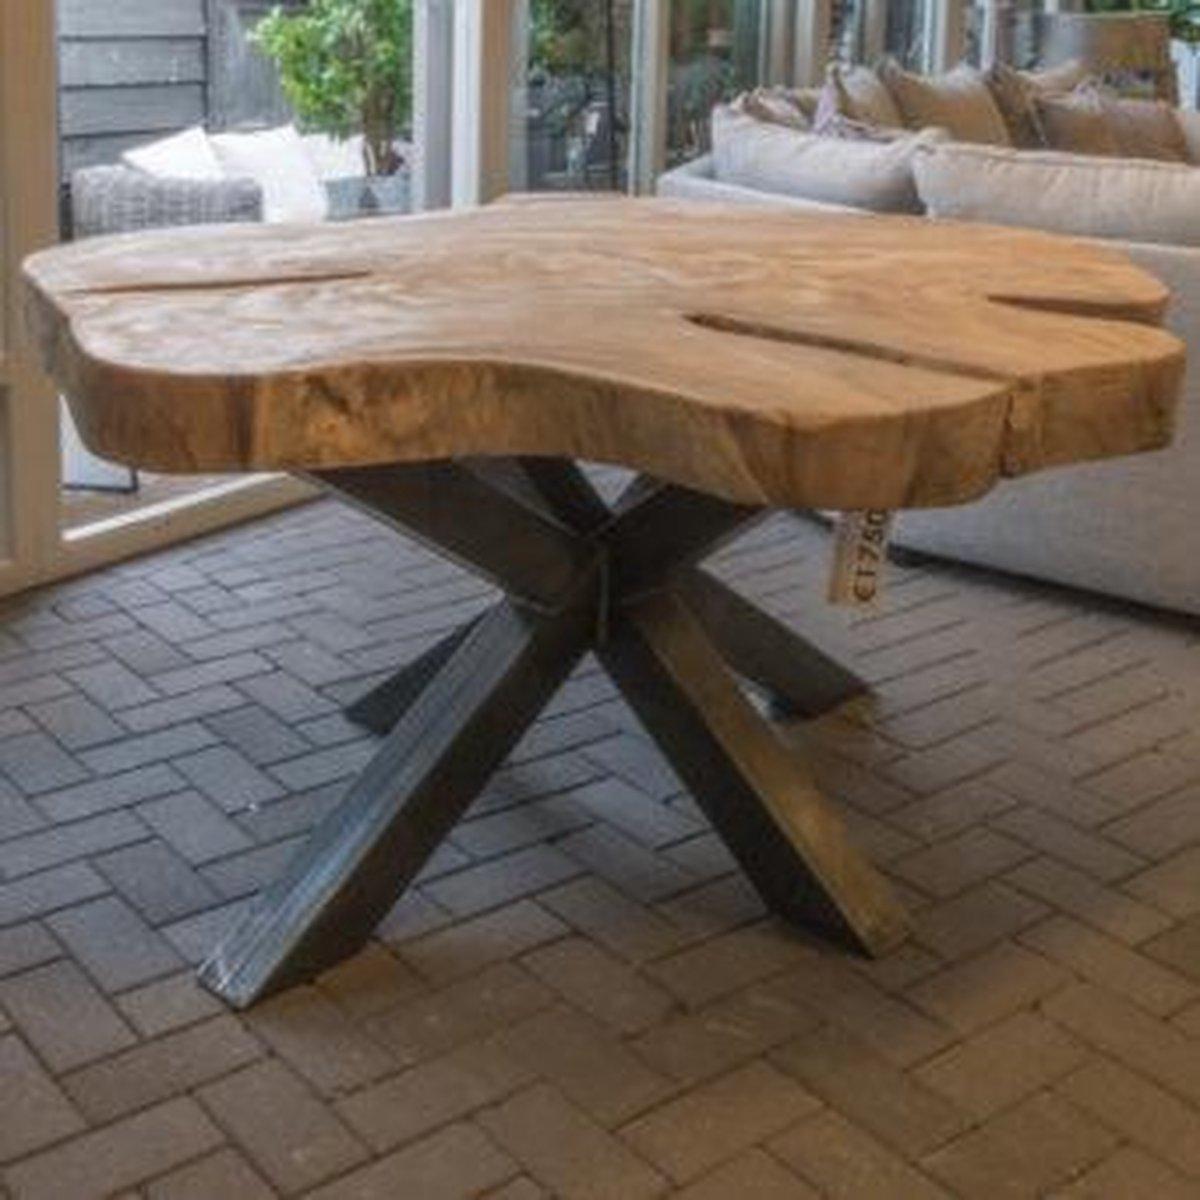 Hedendaags bol.com | Boomstamtafel rond met spinpoot 150 cm OT-89